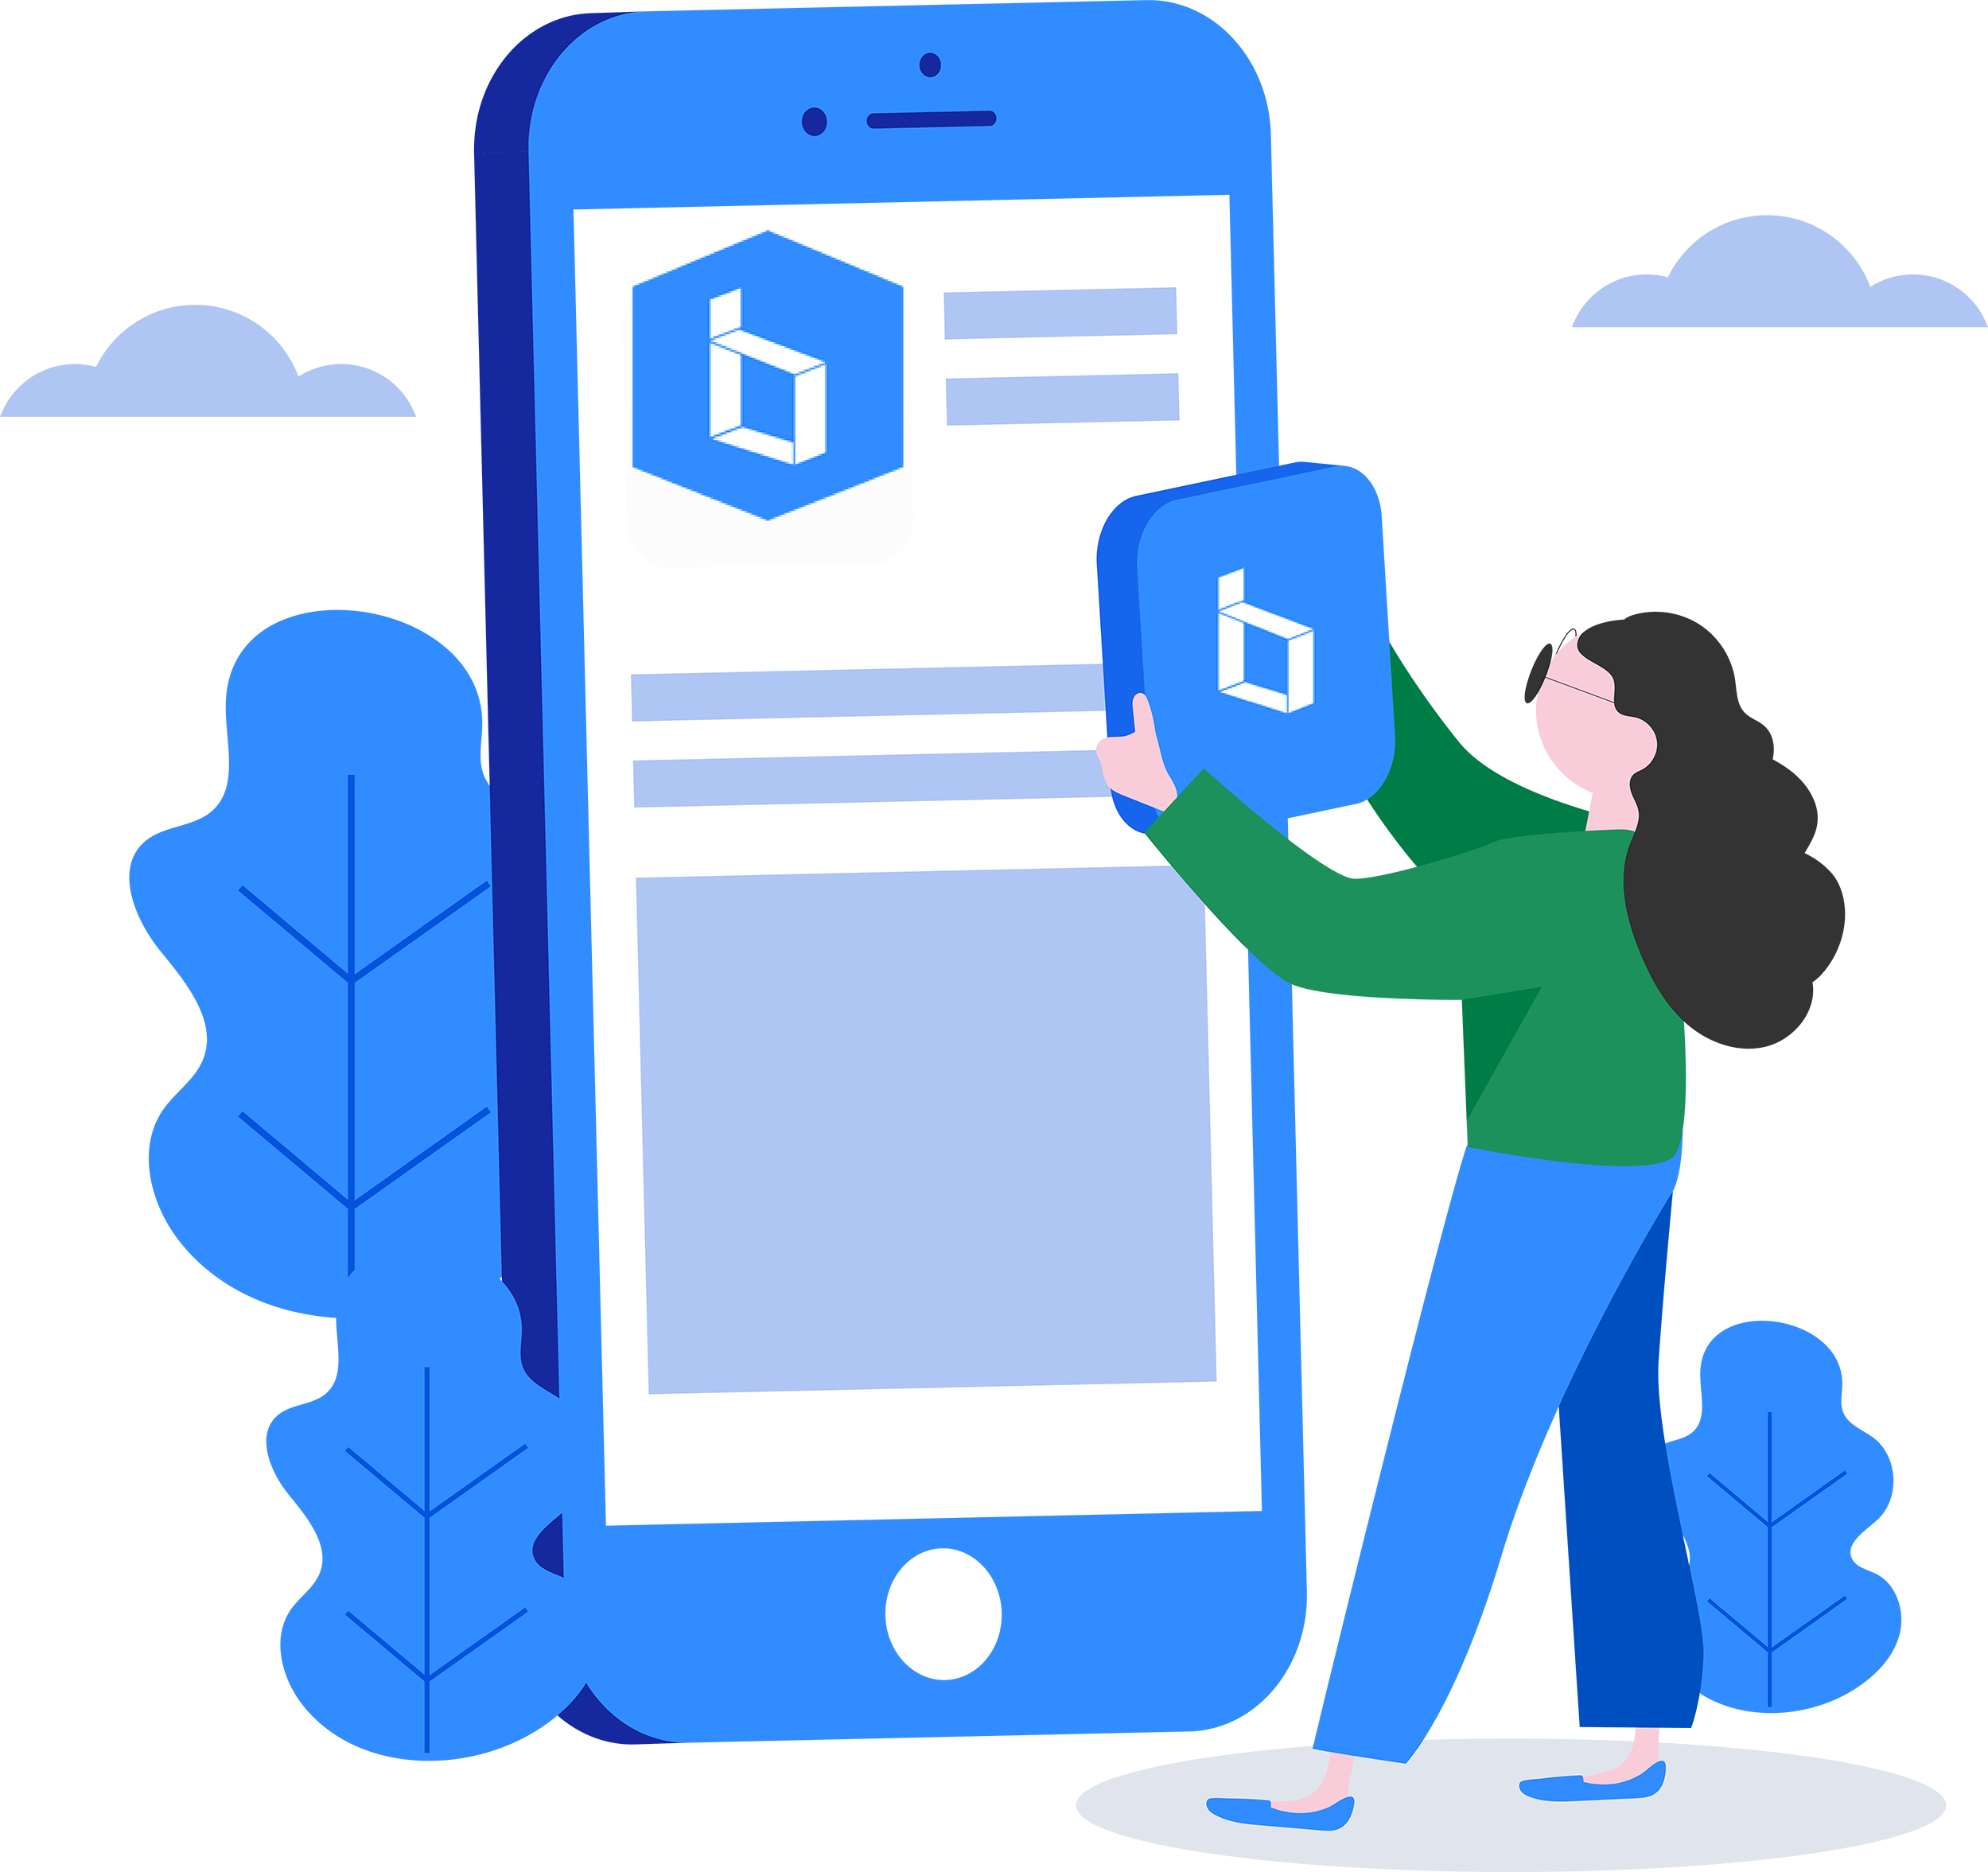 app laten maken1 - App laten maken - Brixxs